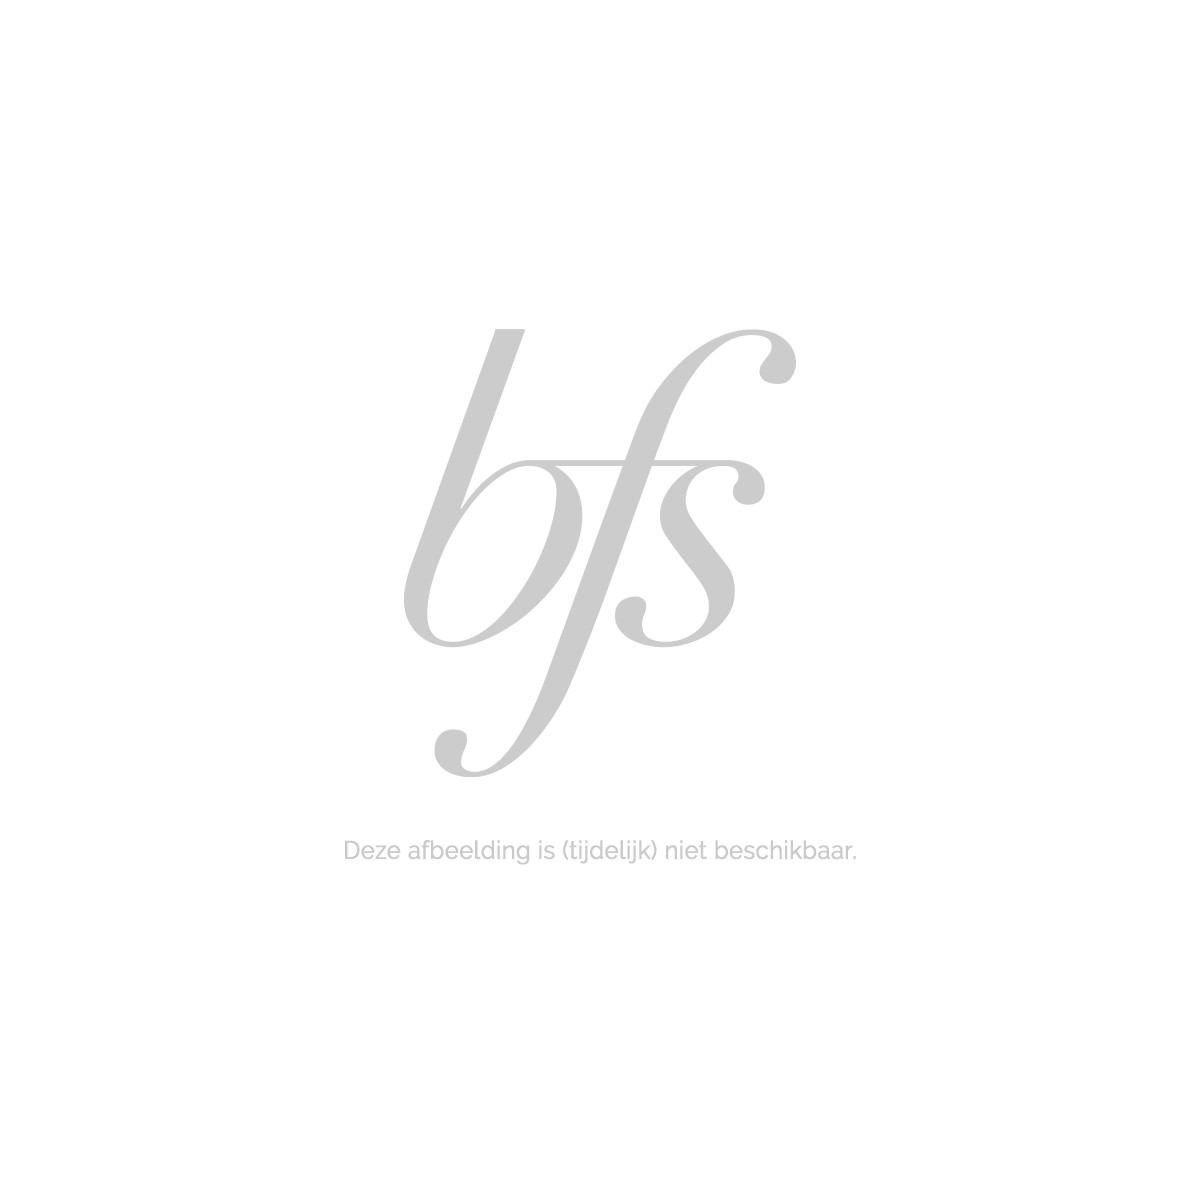 DUO Quick-Set Striplash Adhesive White/Clear